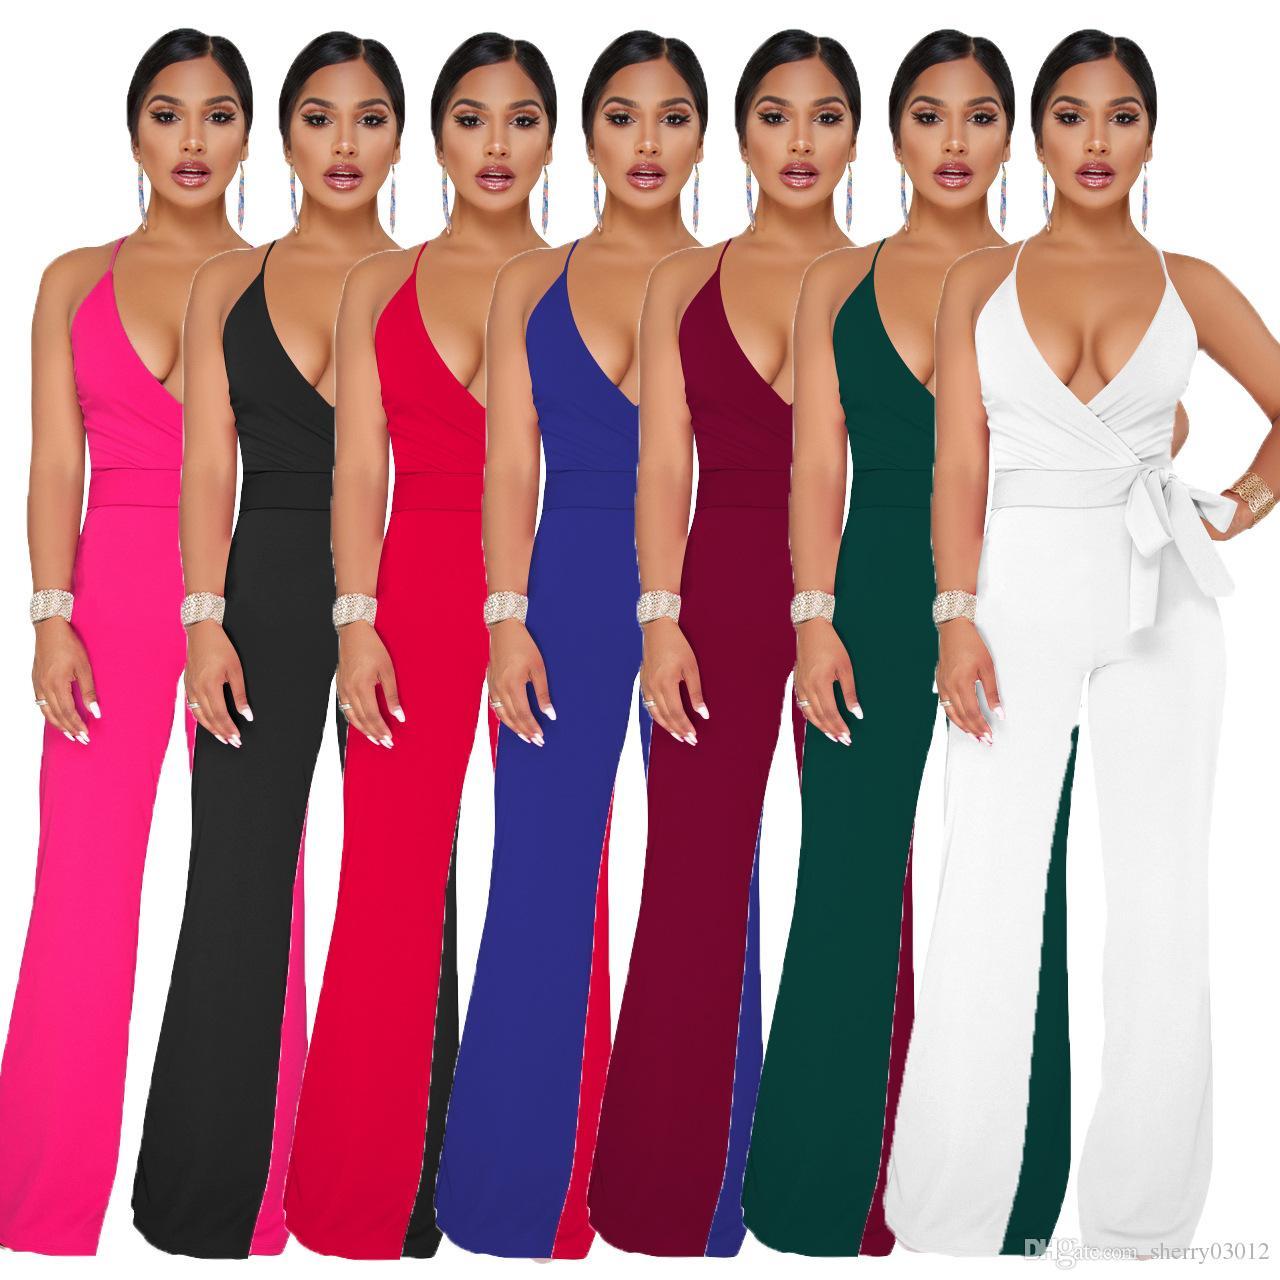 08830d3b72e 2019 New Summer Women s Jumpsuit Sleeveless Solid Color Sling V-neck ...